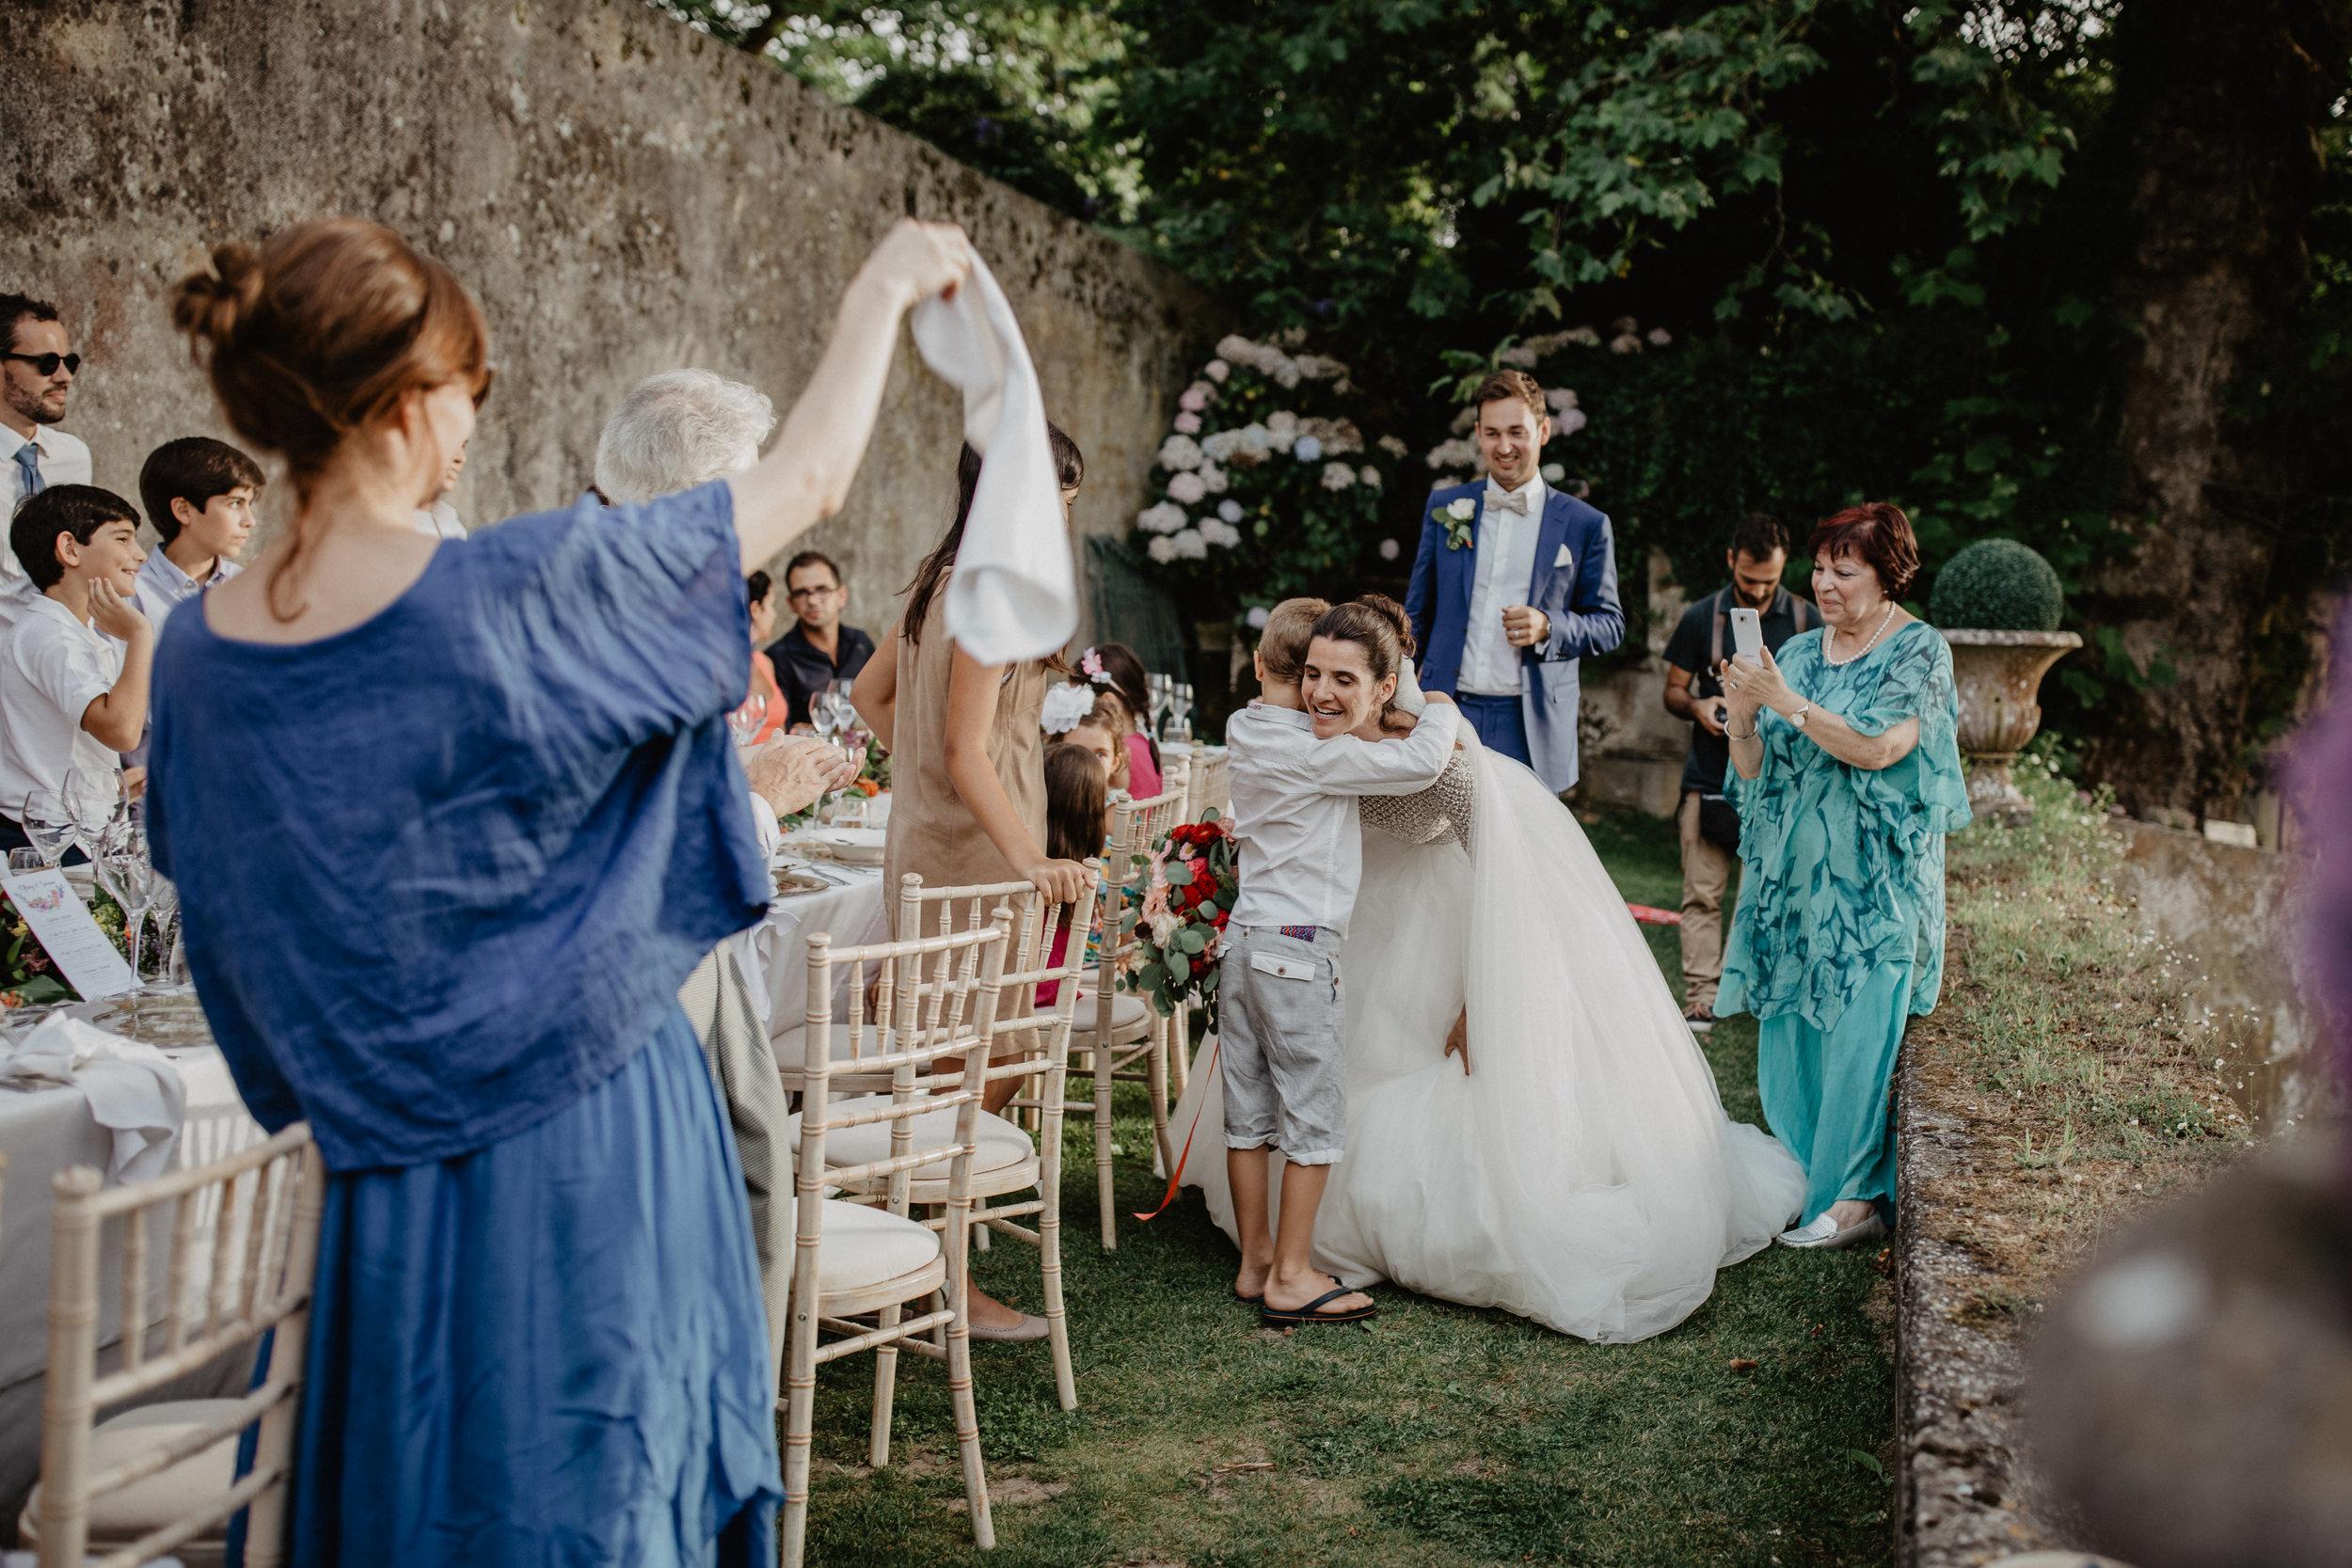 Lapela-photography-wedding-sintra-portugal-109.jpg